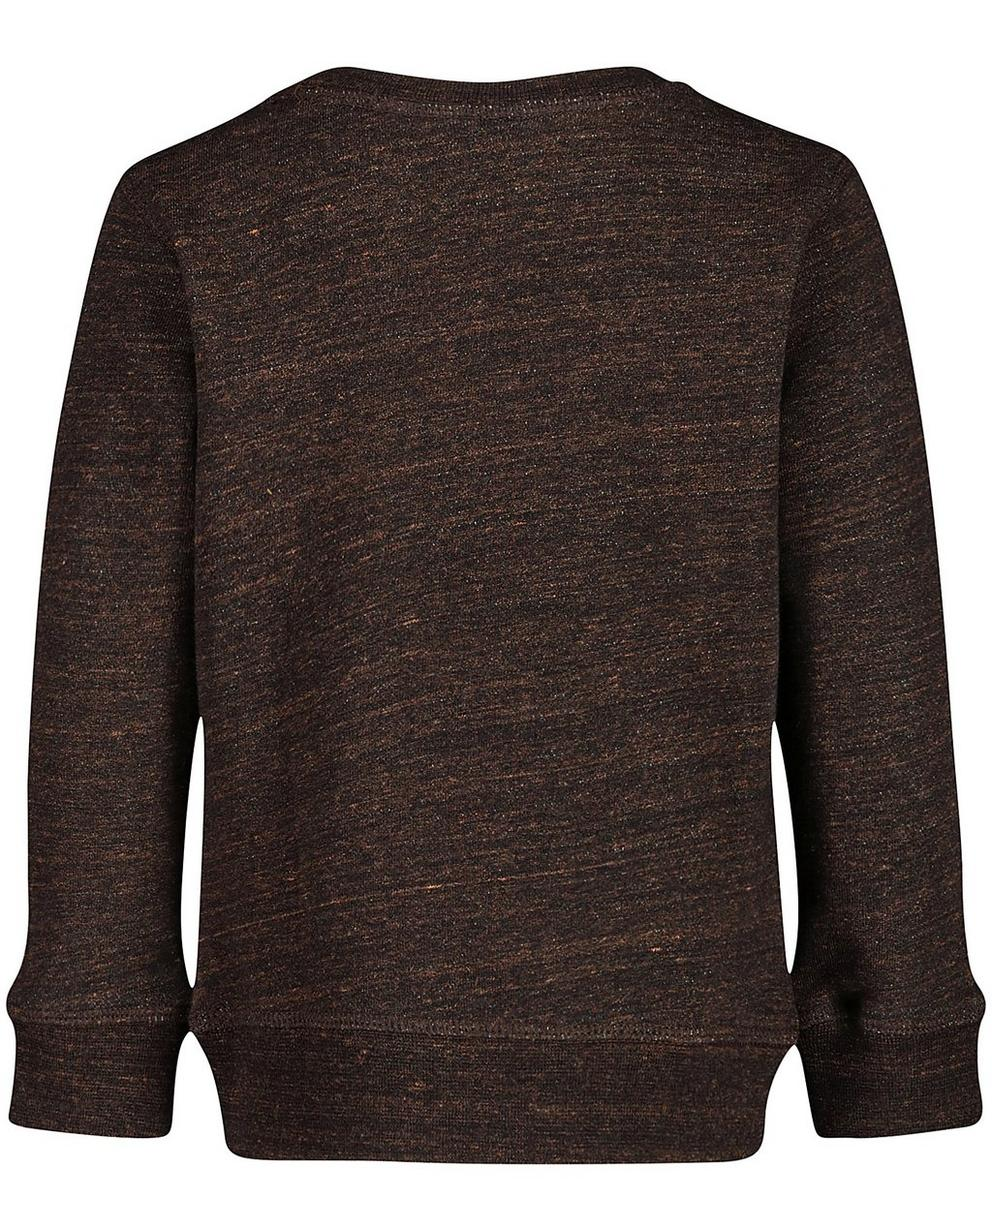 Sweater - Dunkelbraun -